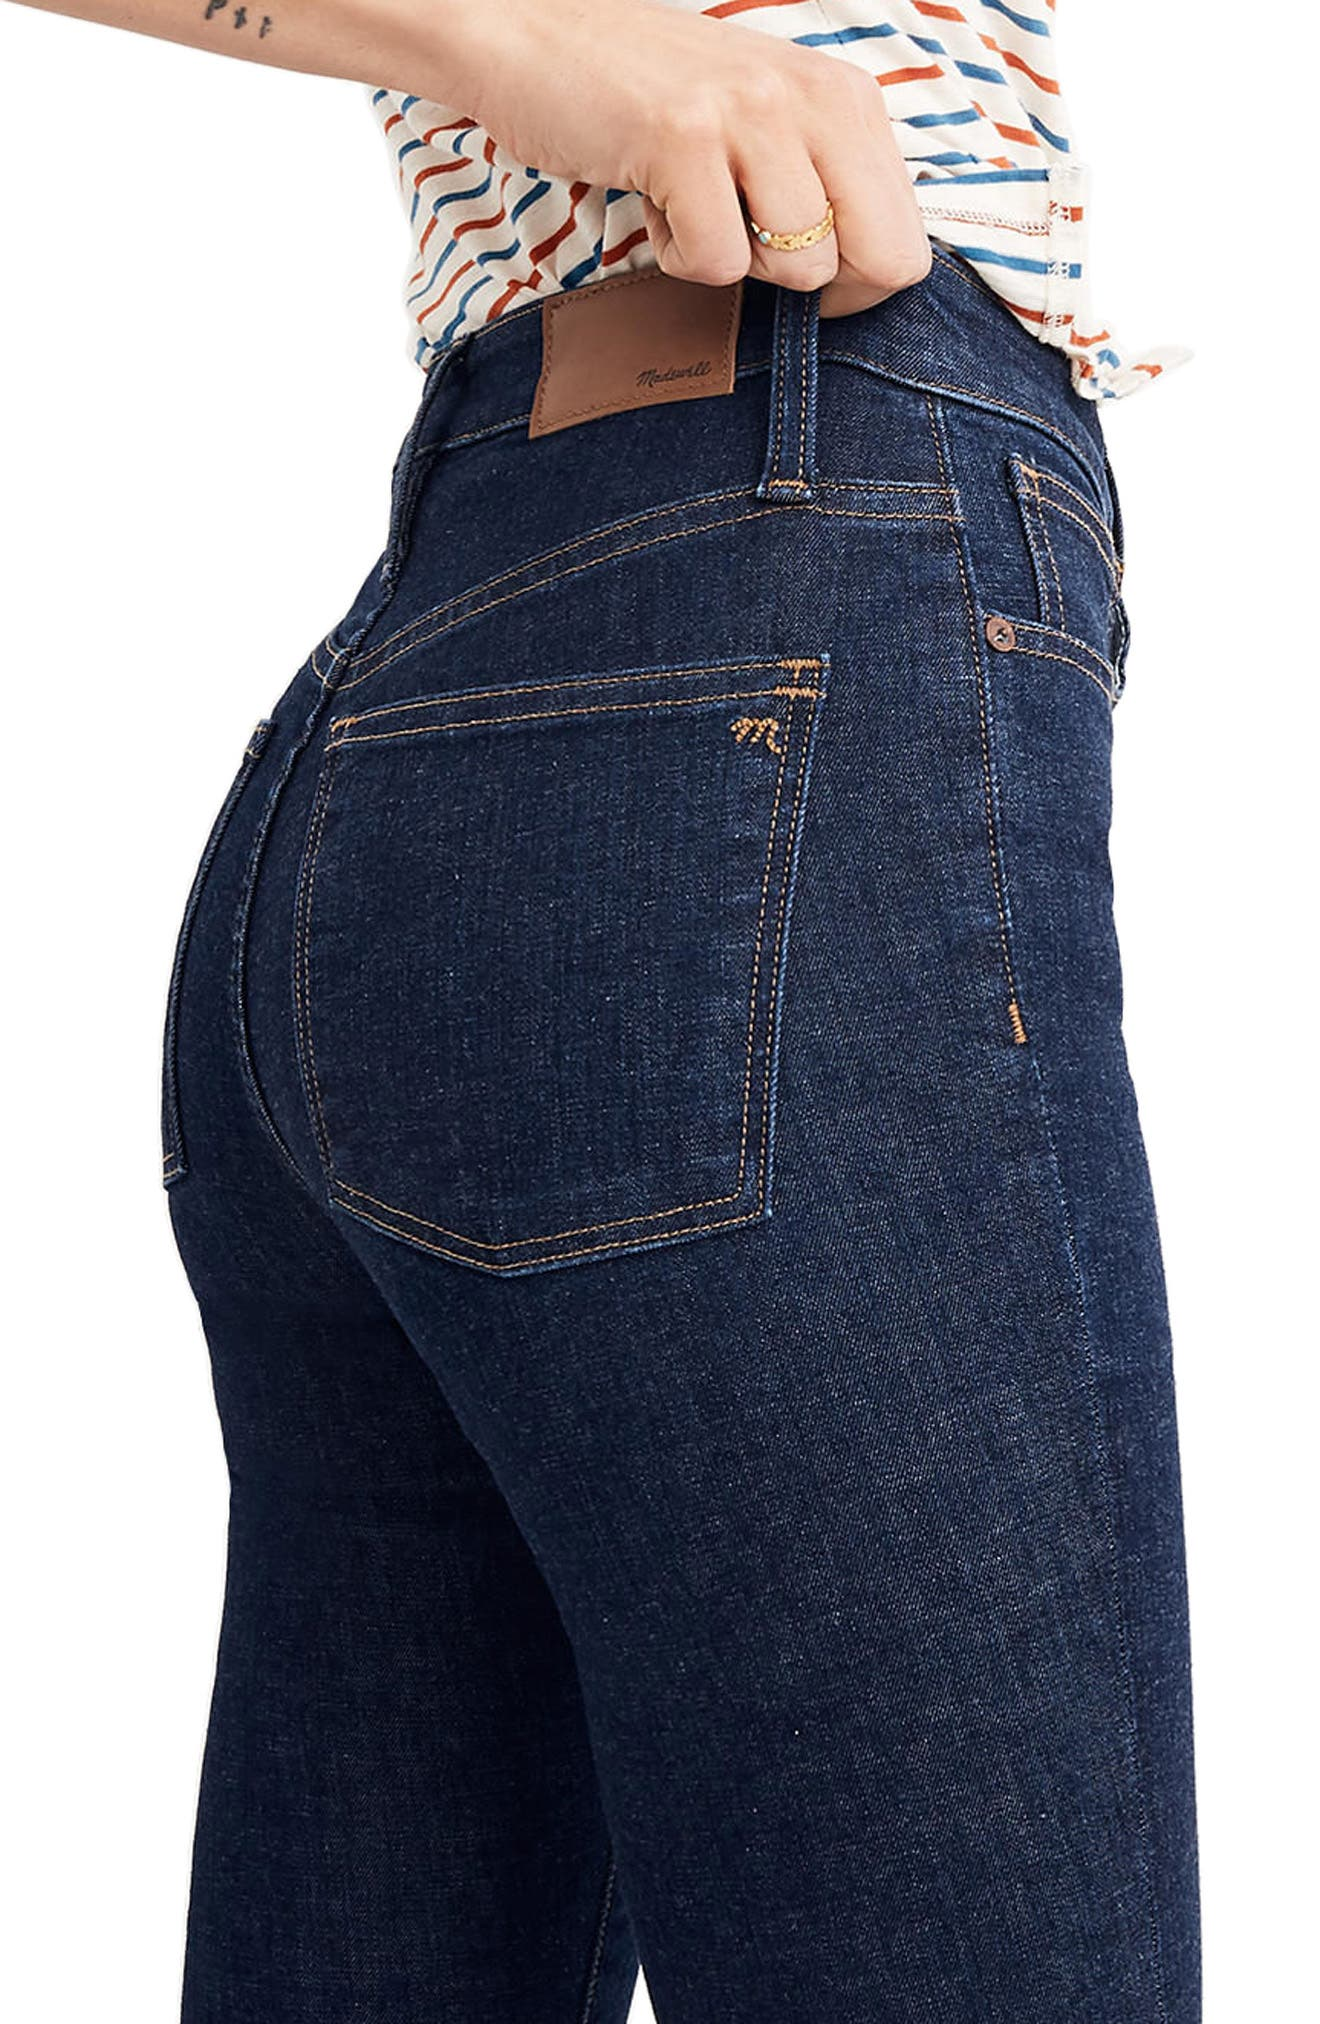 Alternate Image 4  - Madewell Curvy High Waist Skinny Jeans (Lucille)